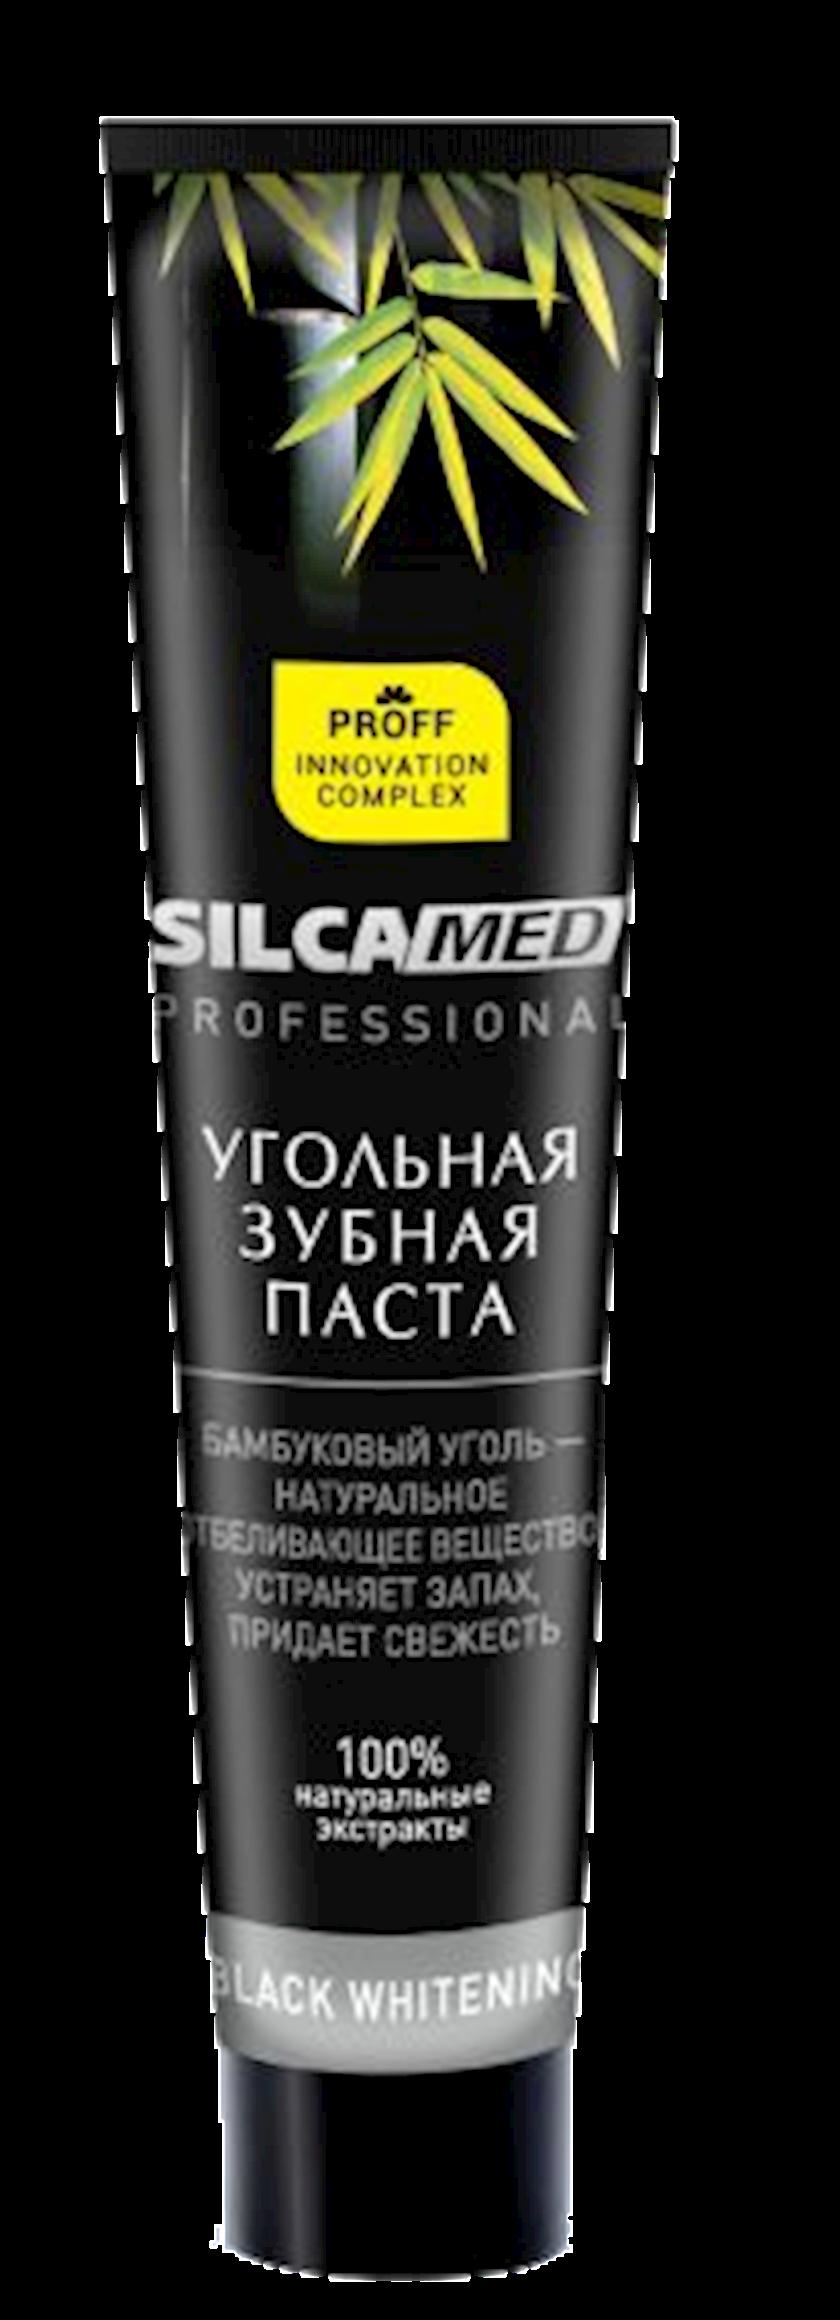 Diş məcunu Silca Med Professional Black Whitening Kömürlü 75 ml